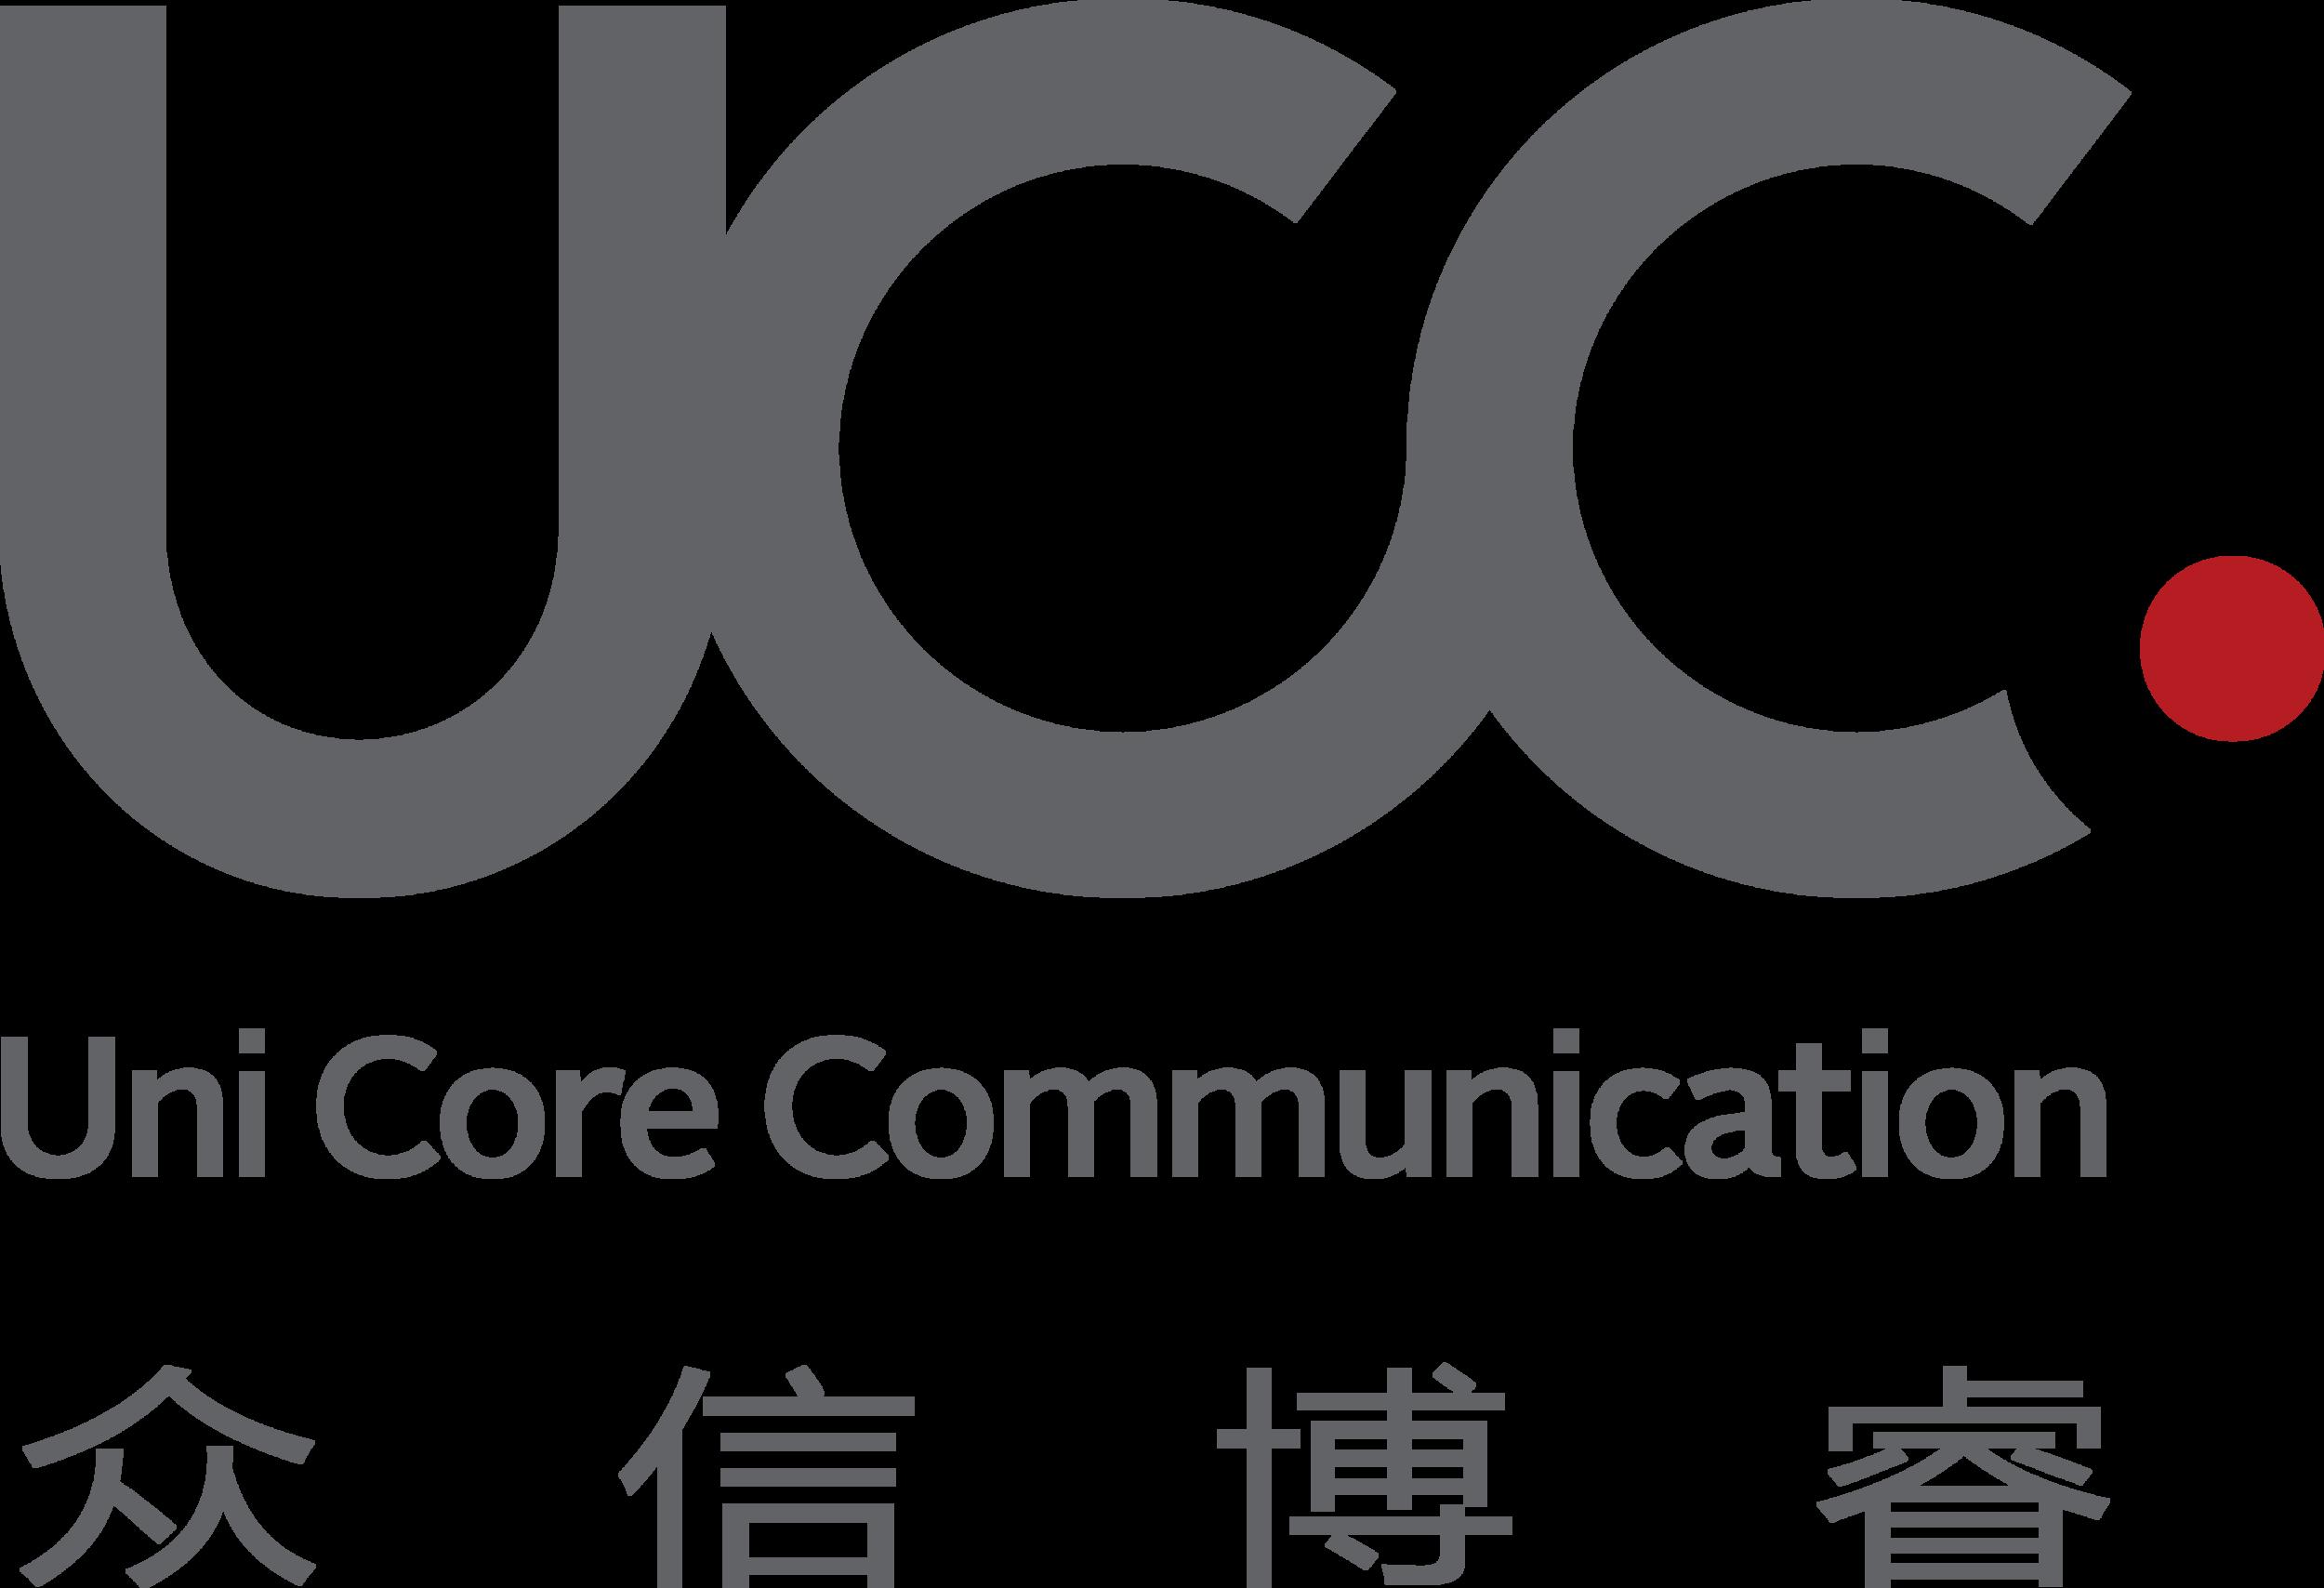 Uni Core Communication Logo.png